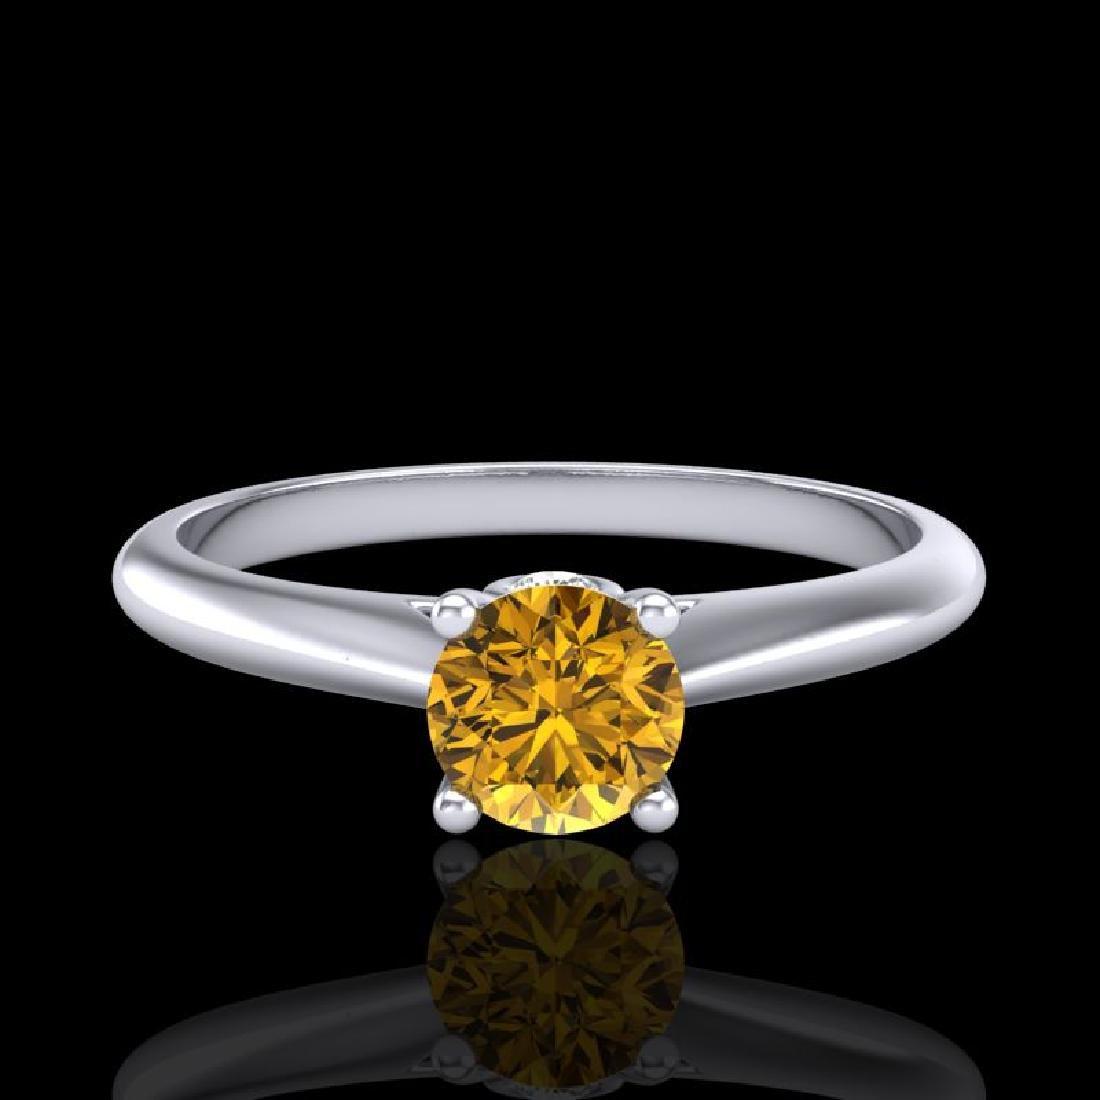 0.4 CTW Intense Fancy Yellow Diamond Engagement Art - 2